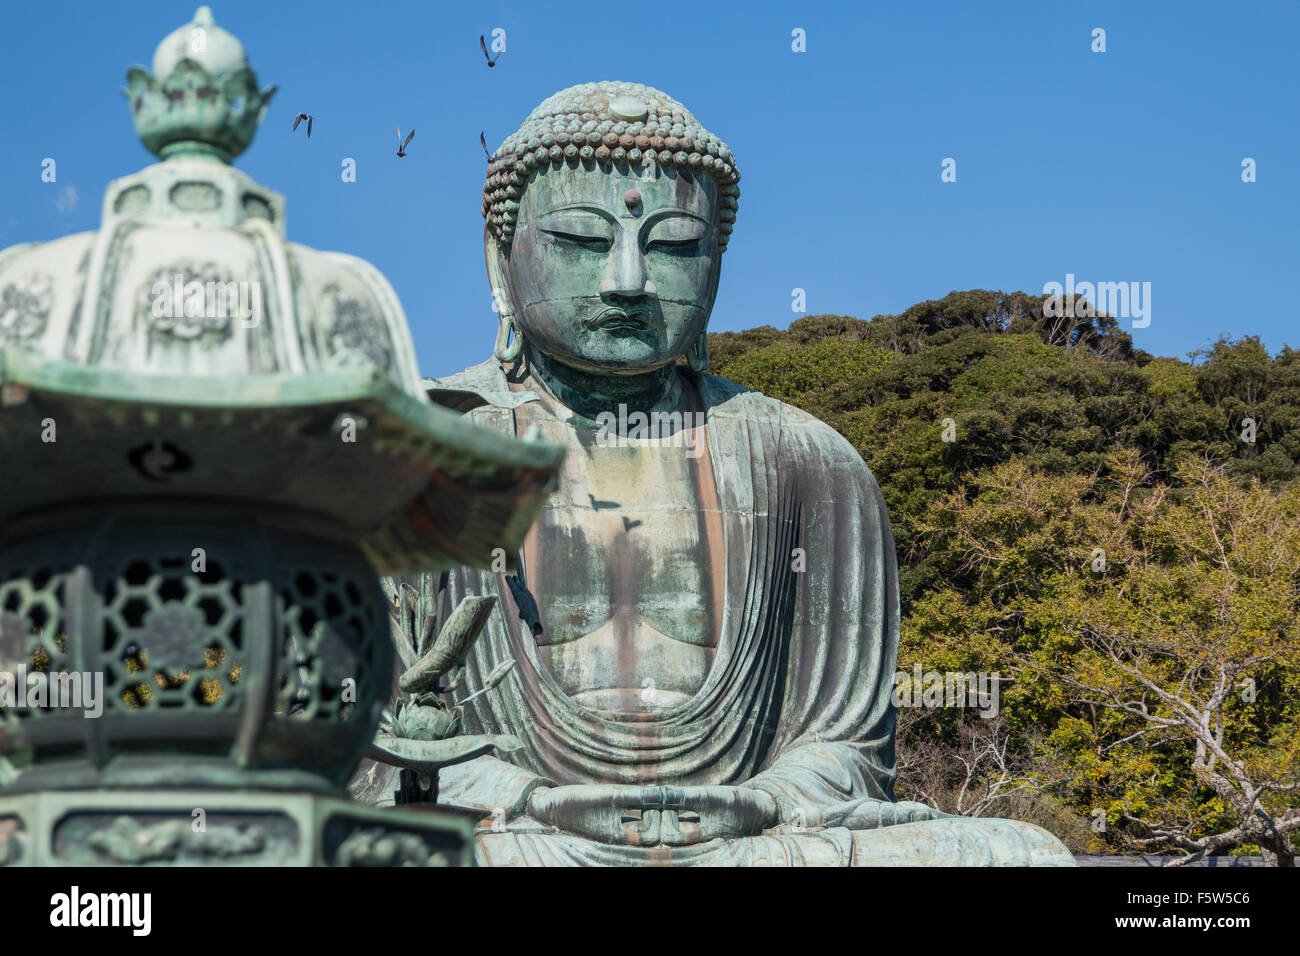 Kotokuin (Great Buddha of Kamakura) - Stock Image